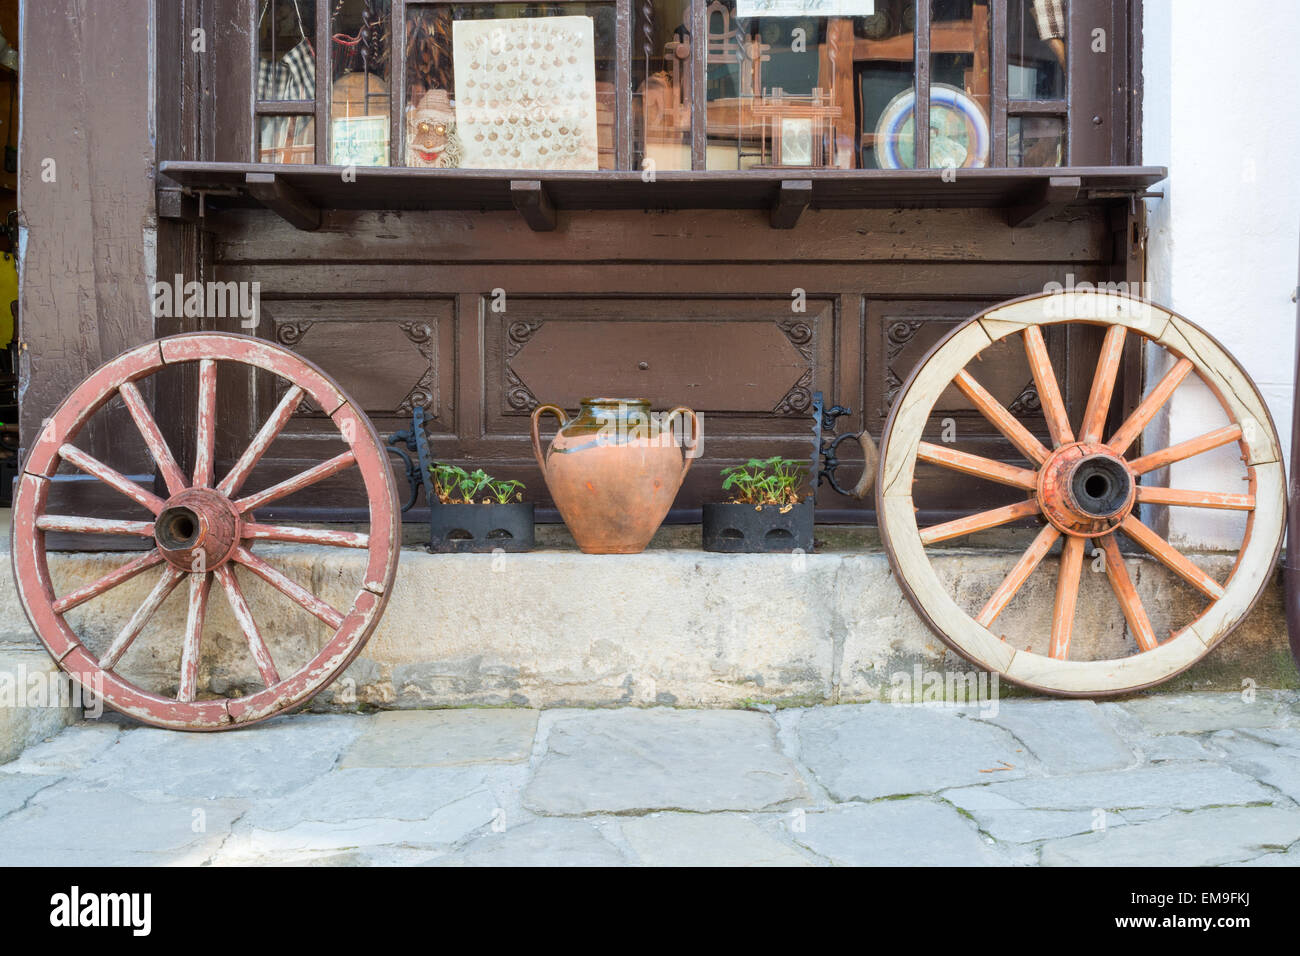 Two Old Wagon Wheels On A Street, Tryavna, Bulgaria